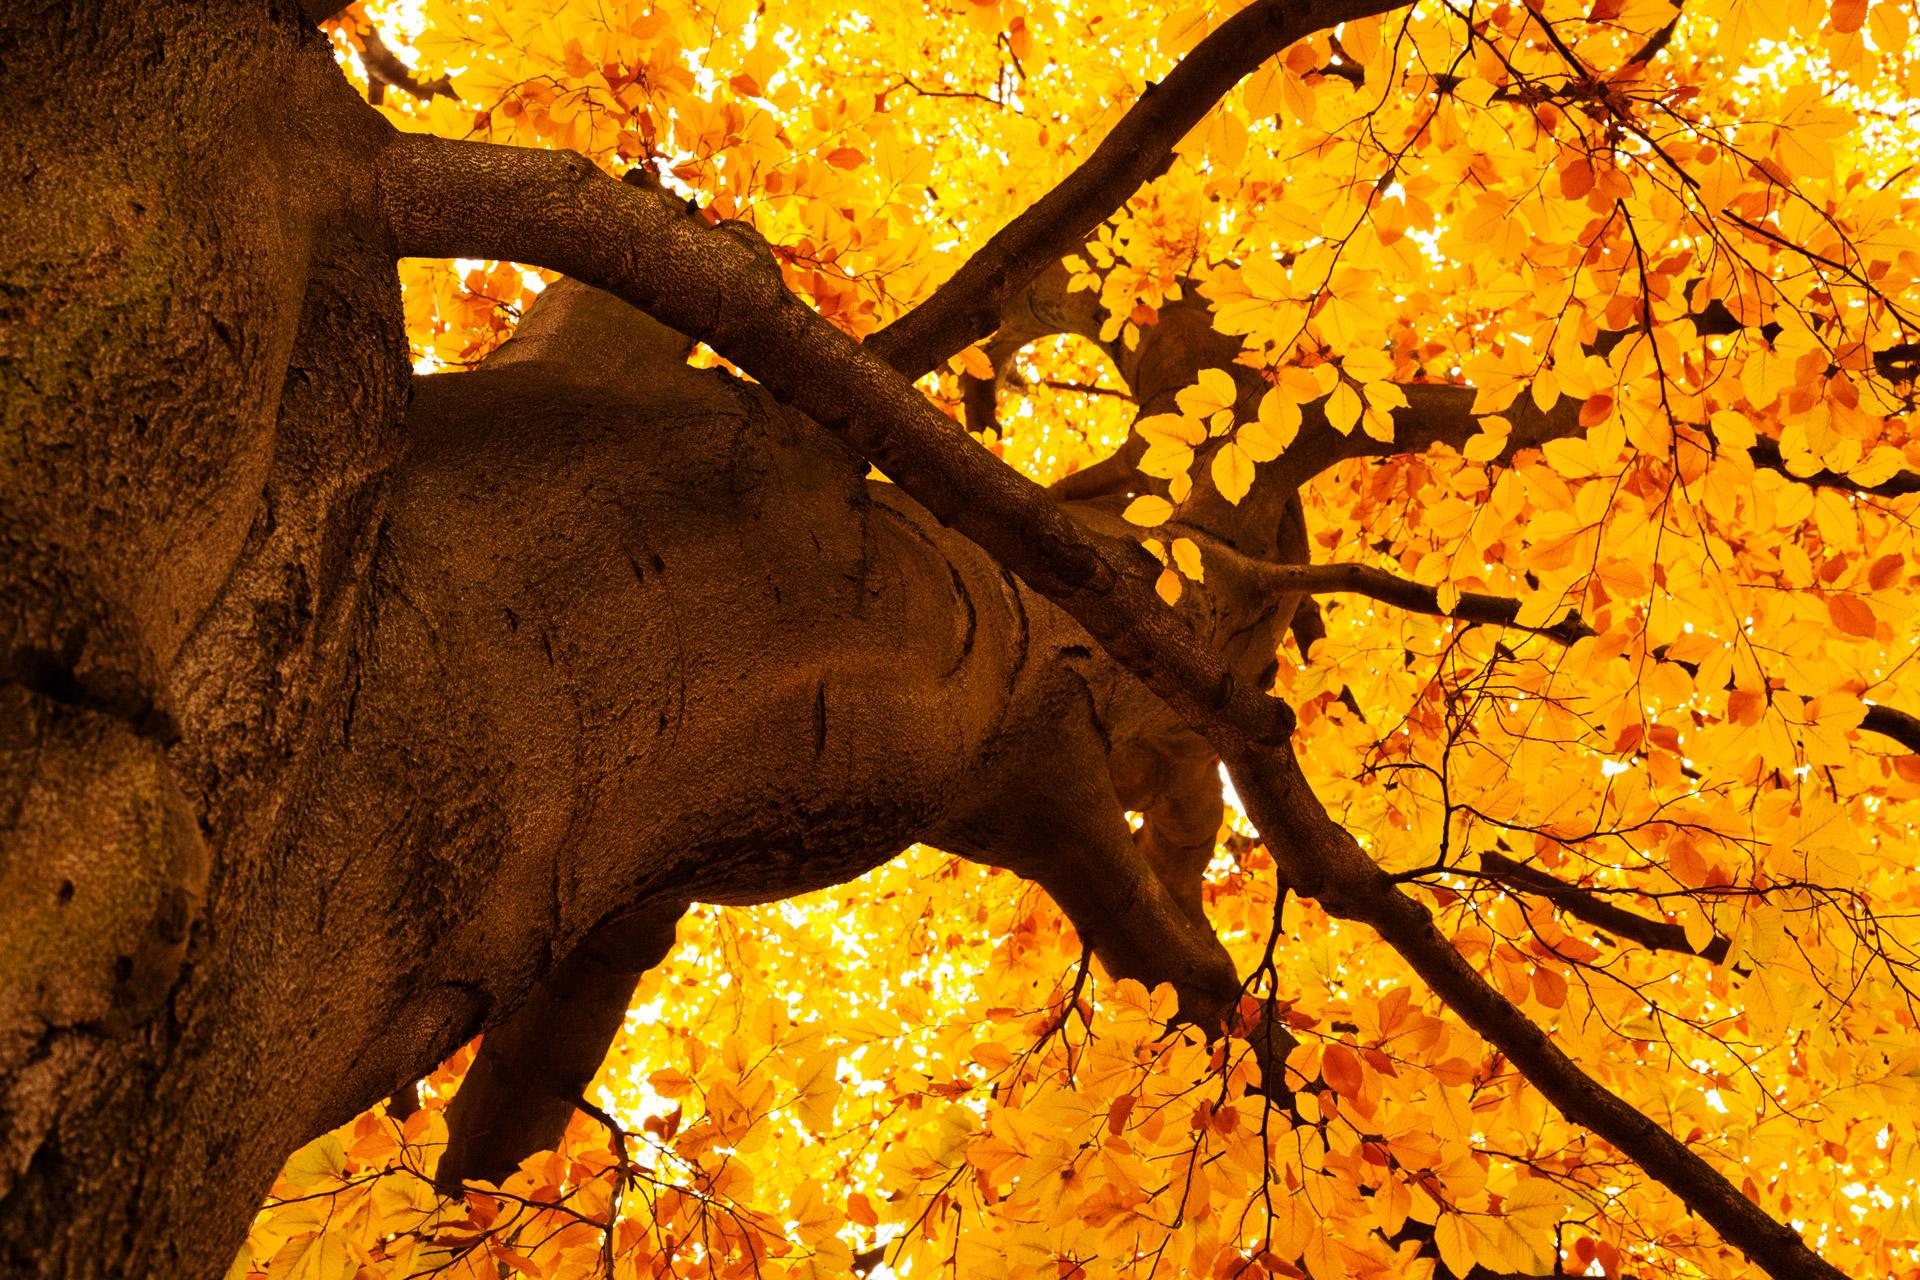 Fall Colors Desktop Wallpaper Yellow Tree In Autumn Free Stock Photo Public Domain